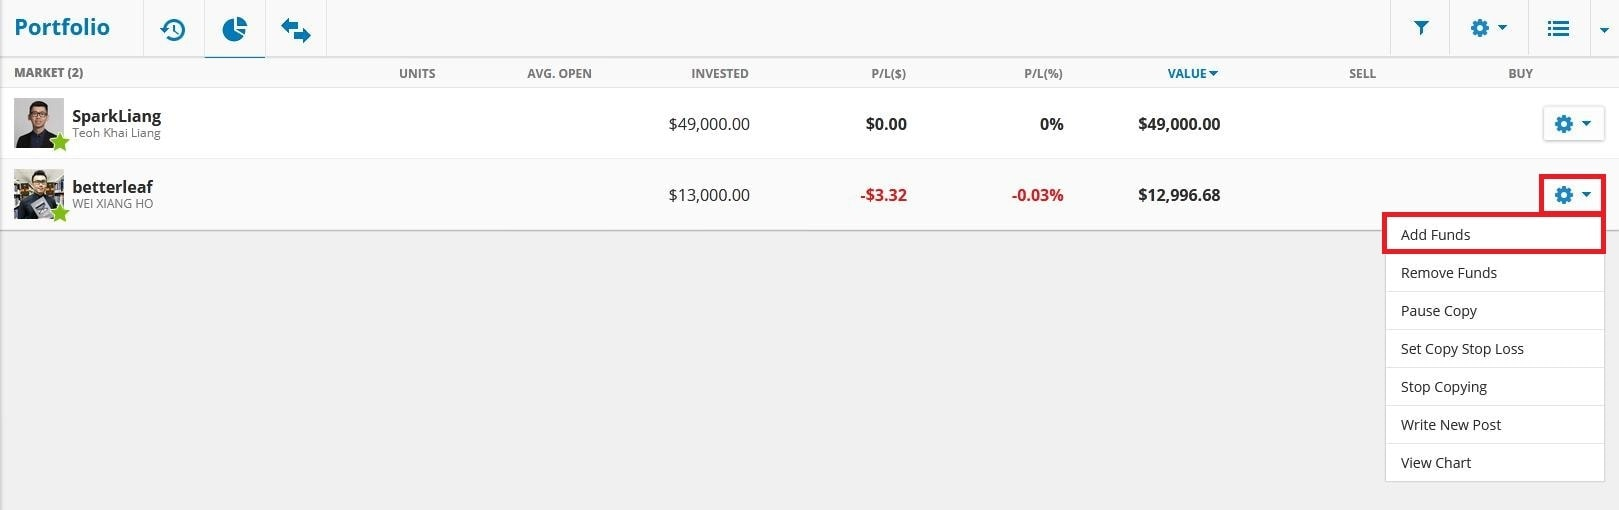 Invest more money in good investors